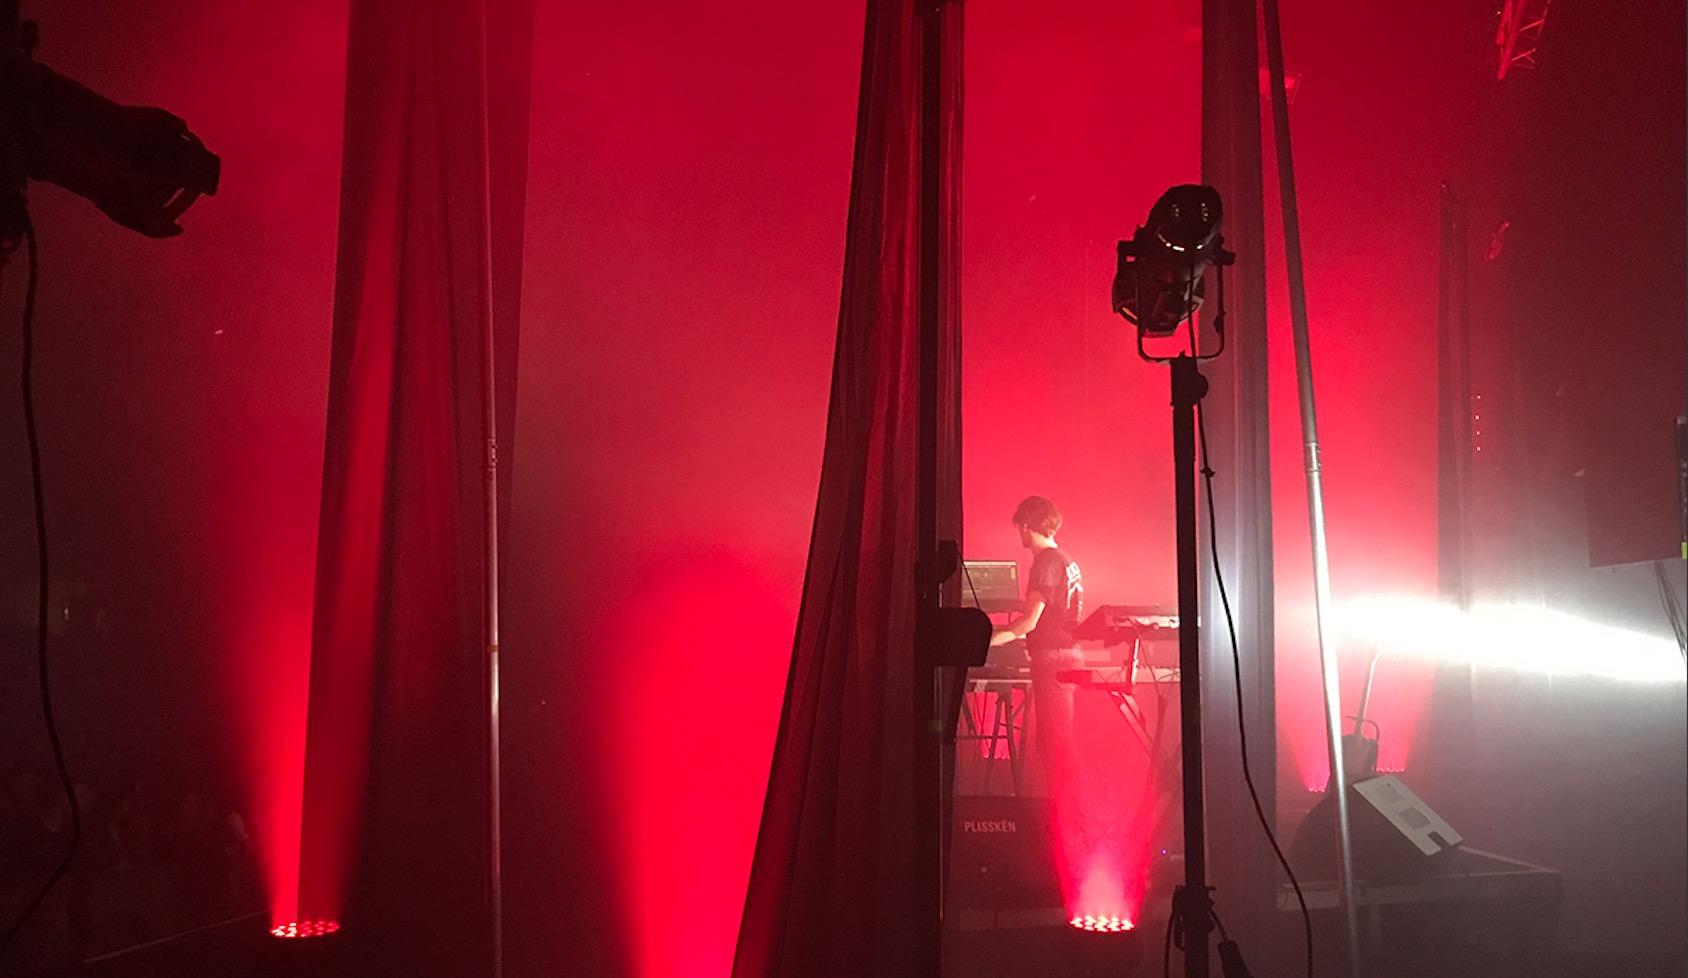 Plisskën Winter Festival 2018 | ClockSound Review